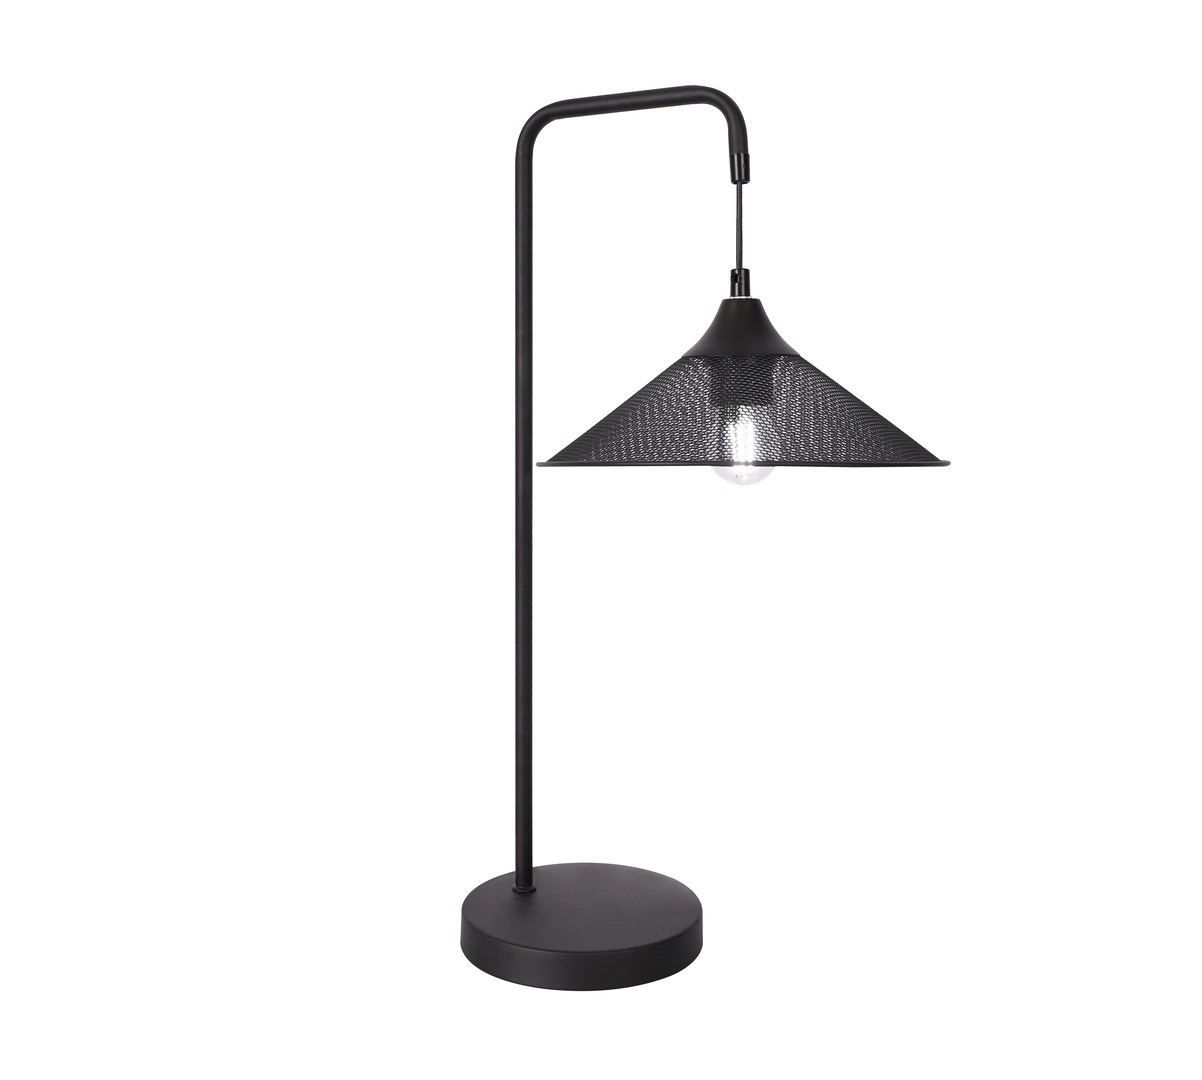 Lampa Stołowa Kiruna 1 Czarny 55X25X30